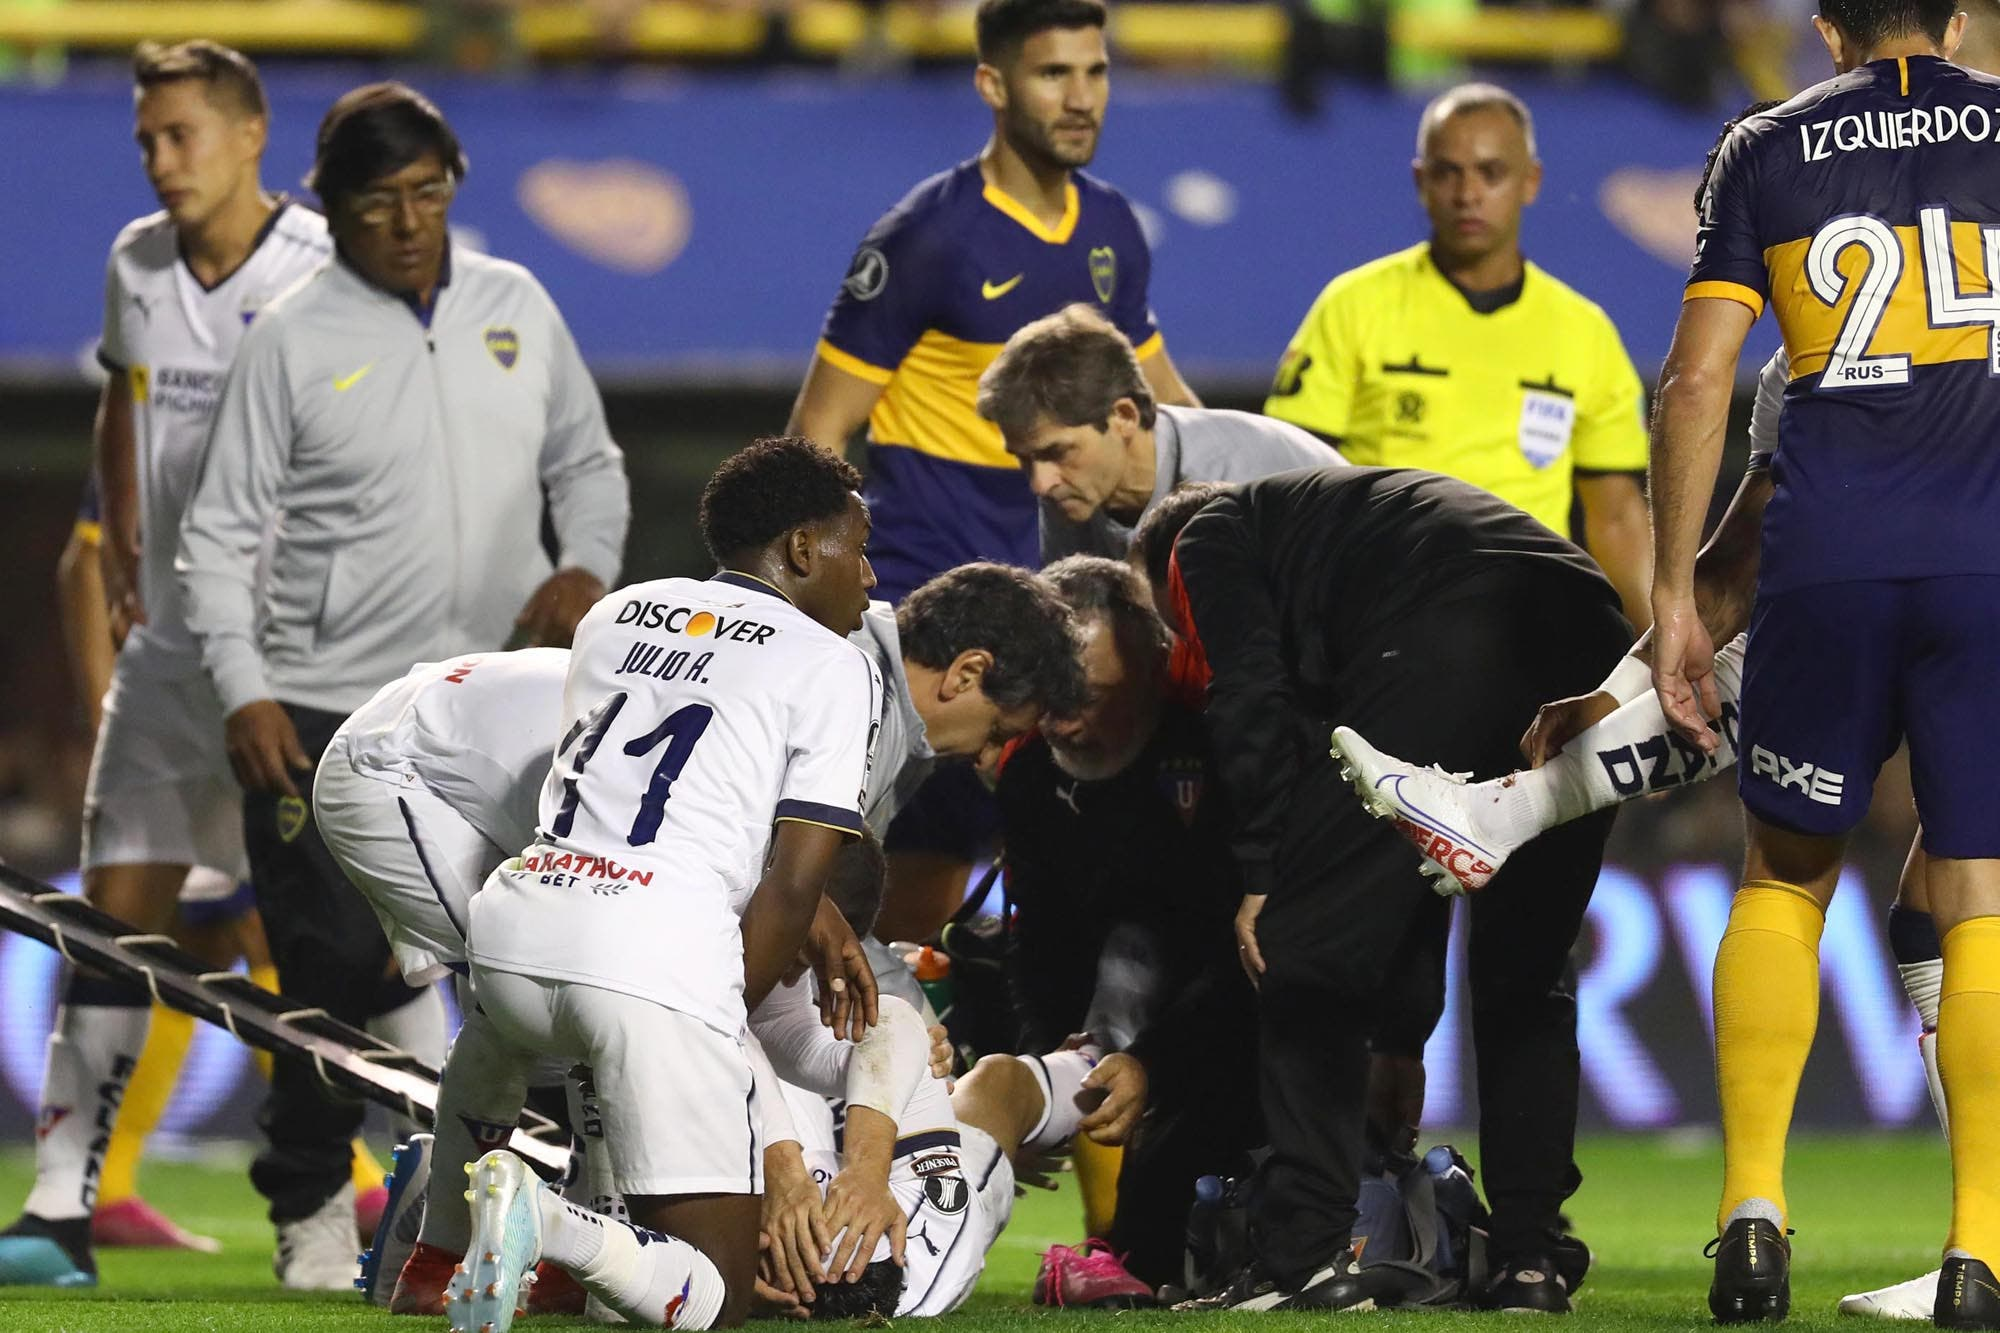 Boca-Liga de Quito: la escalofriante lesión que sufrió Christian Cruz (no apta para impresionables)